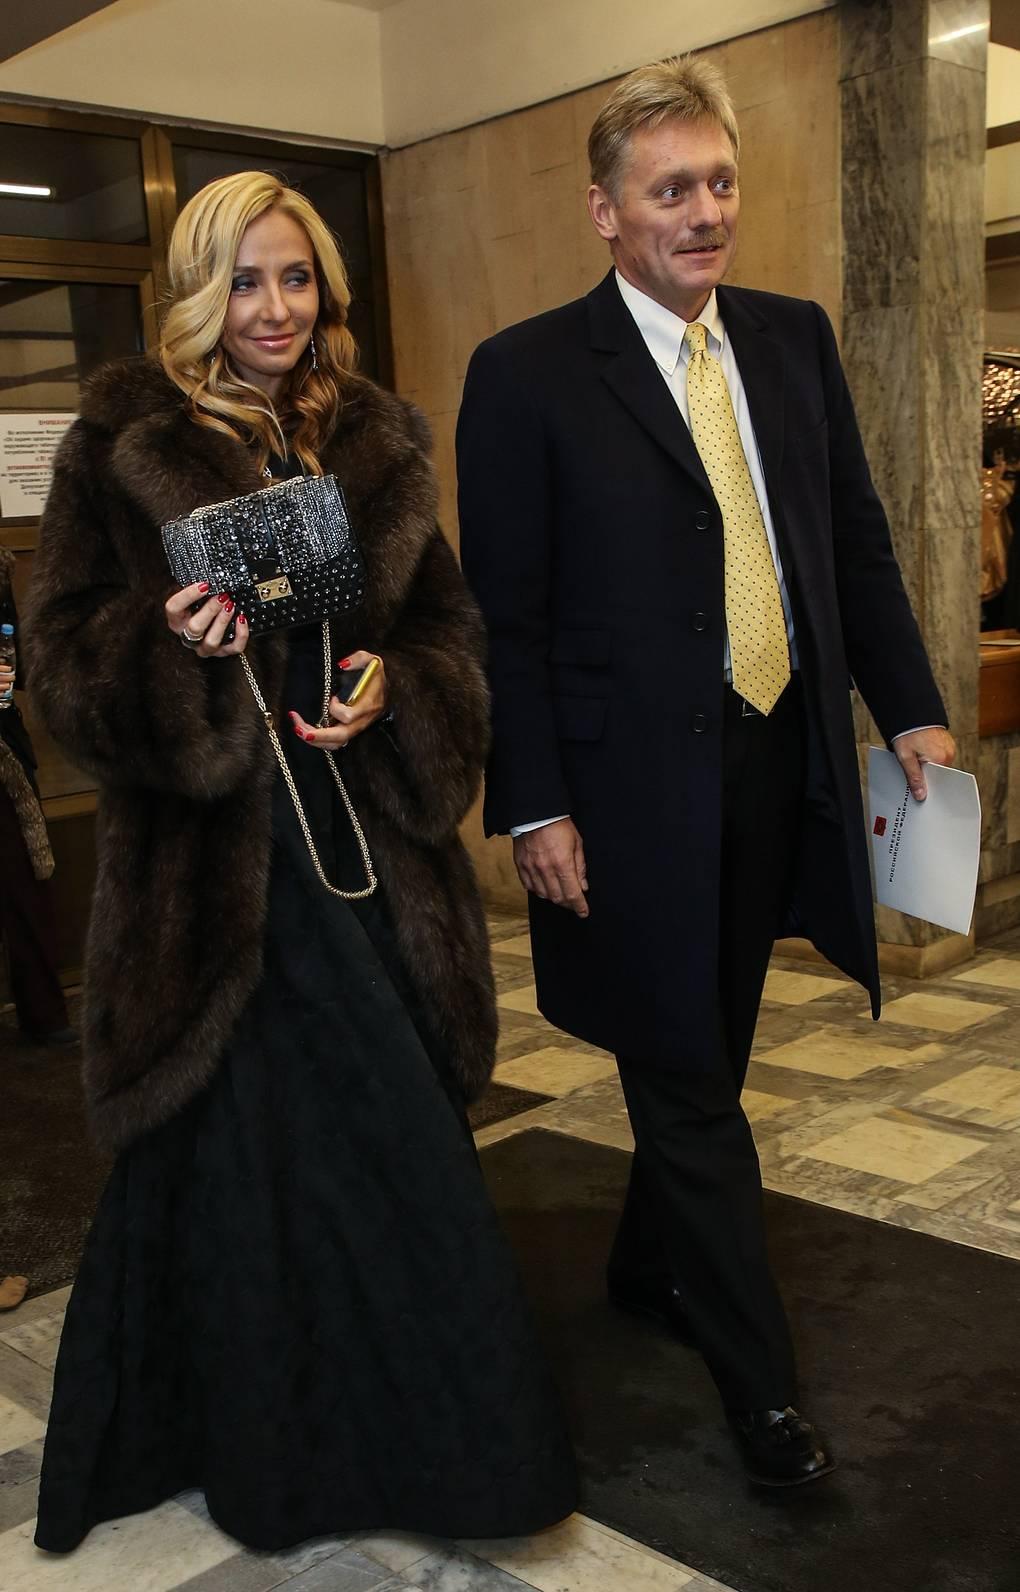 Татьяна Навка - самая богатая кремлевская жена